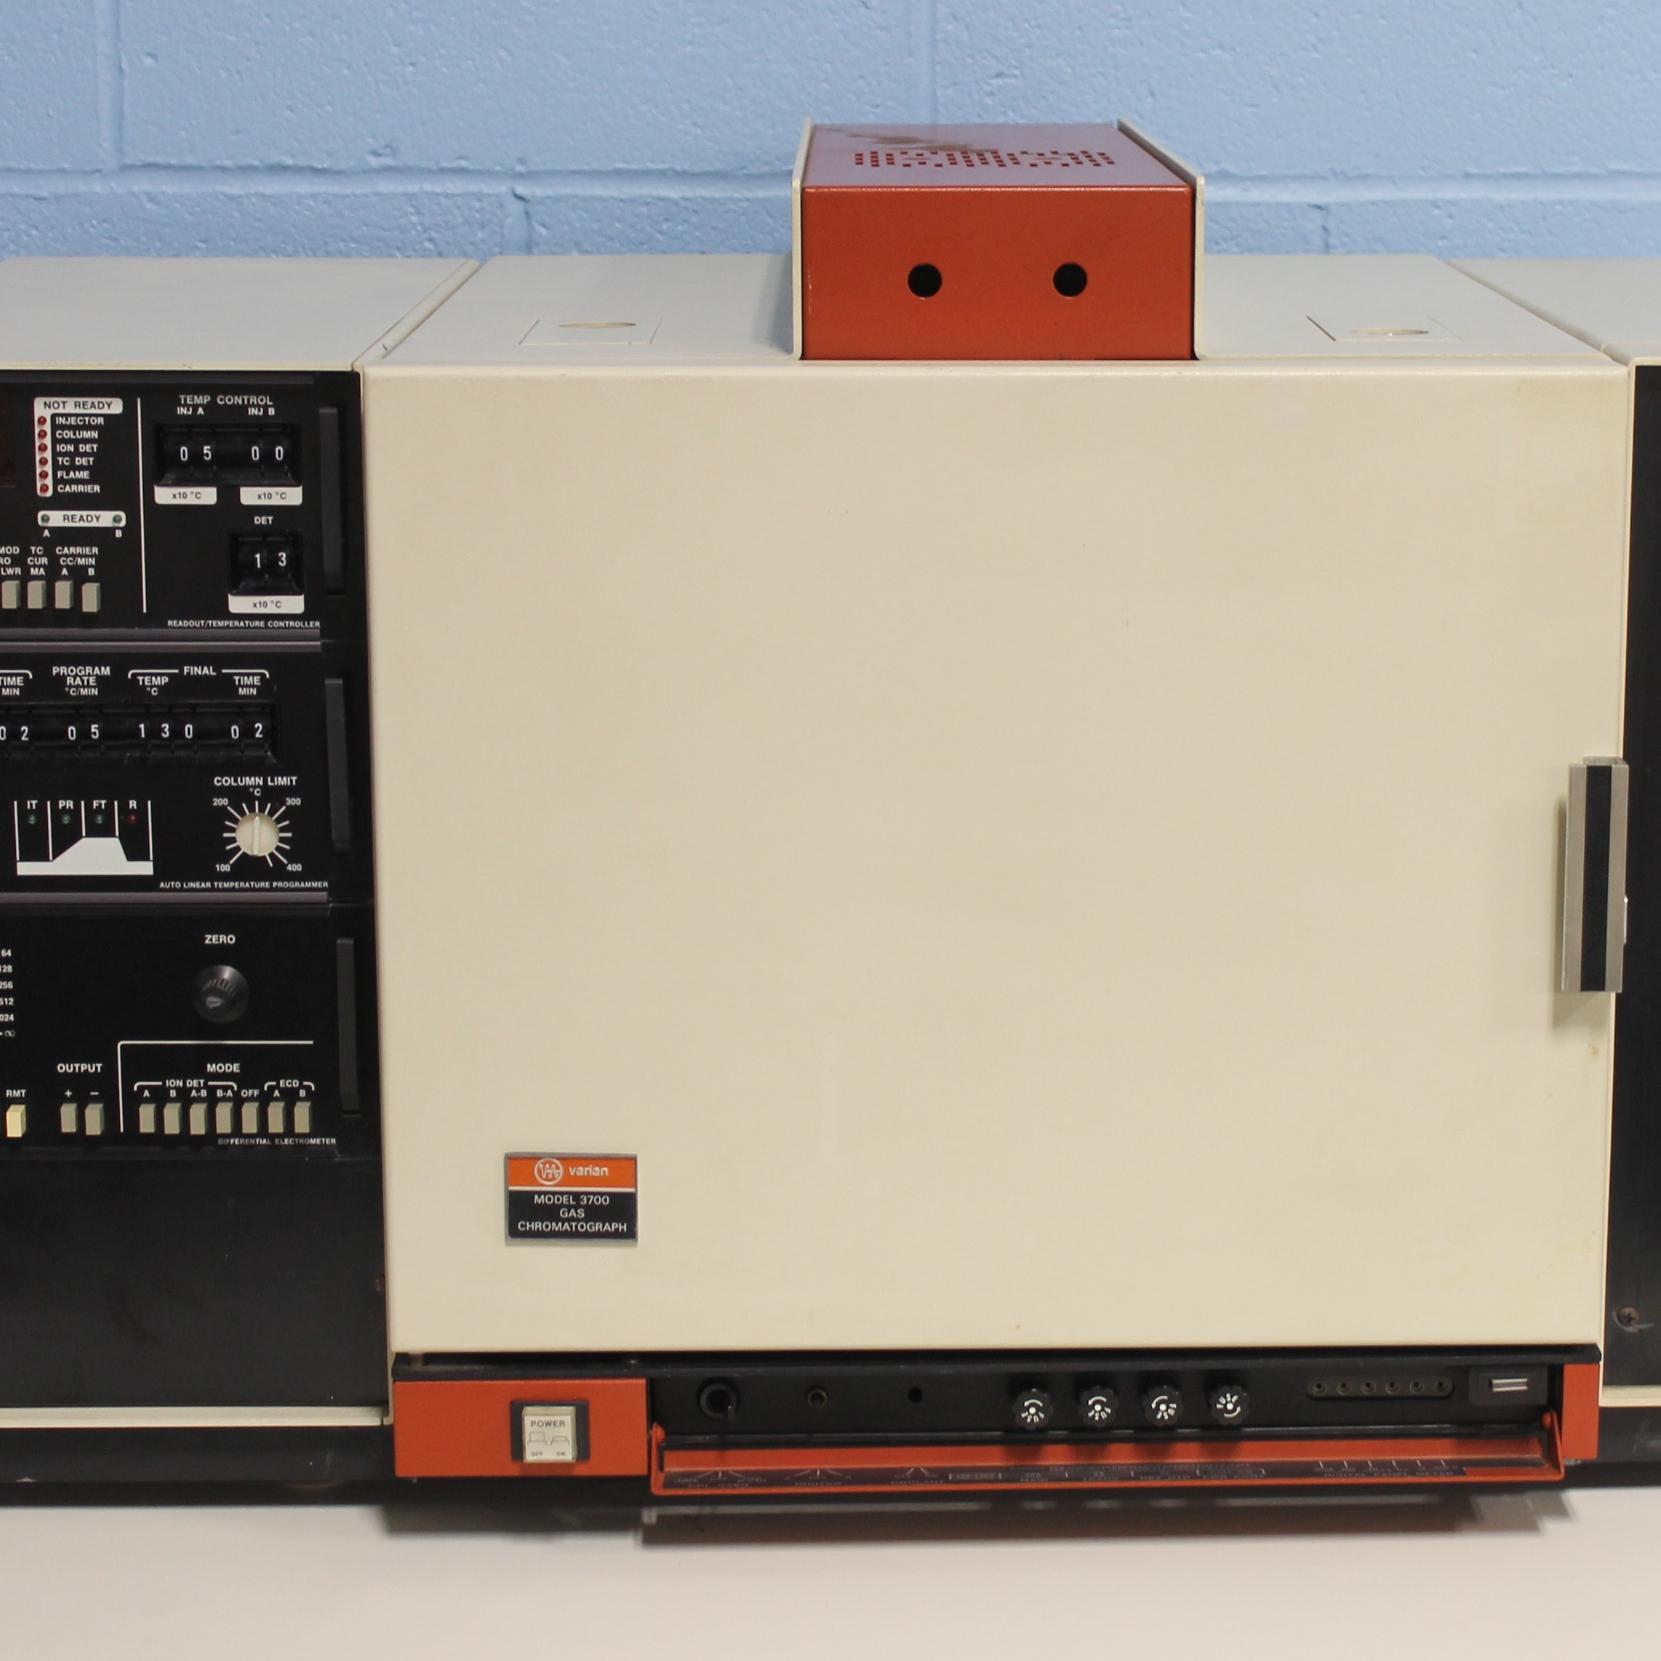 Varian Gas Chromatograph